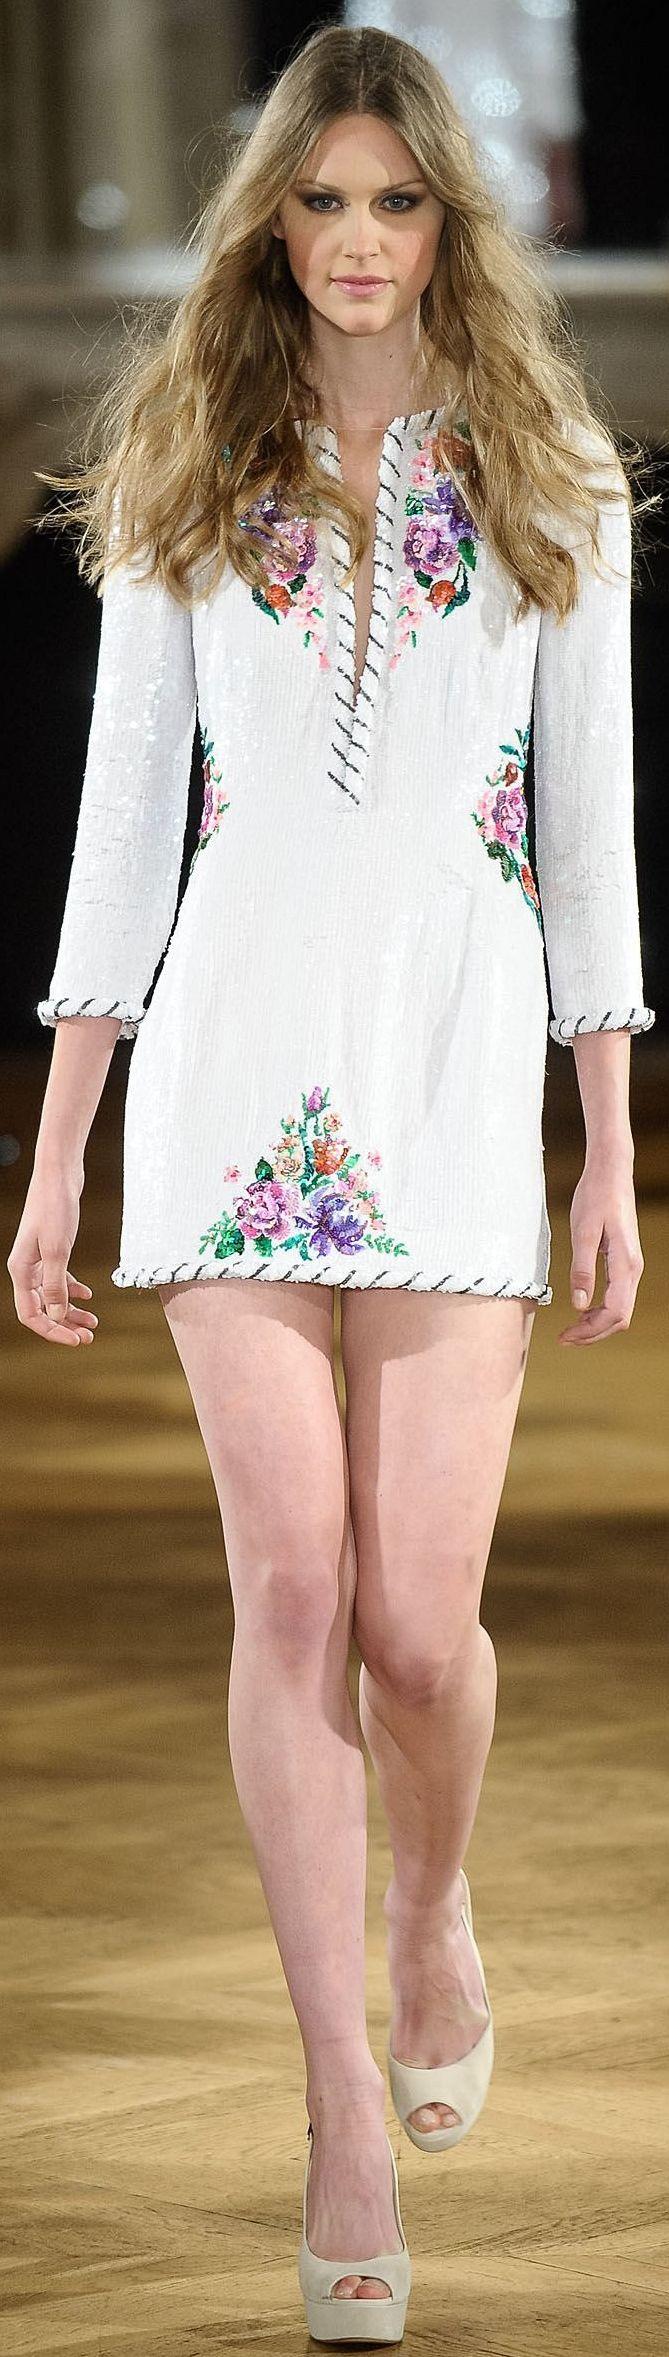 Yulia Yanina Couture - Spring - Summer 2015